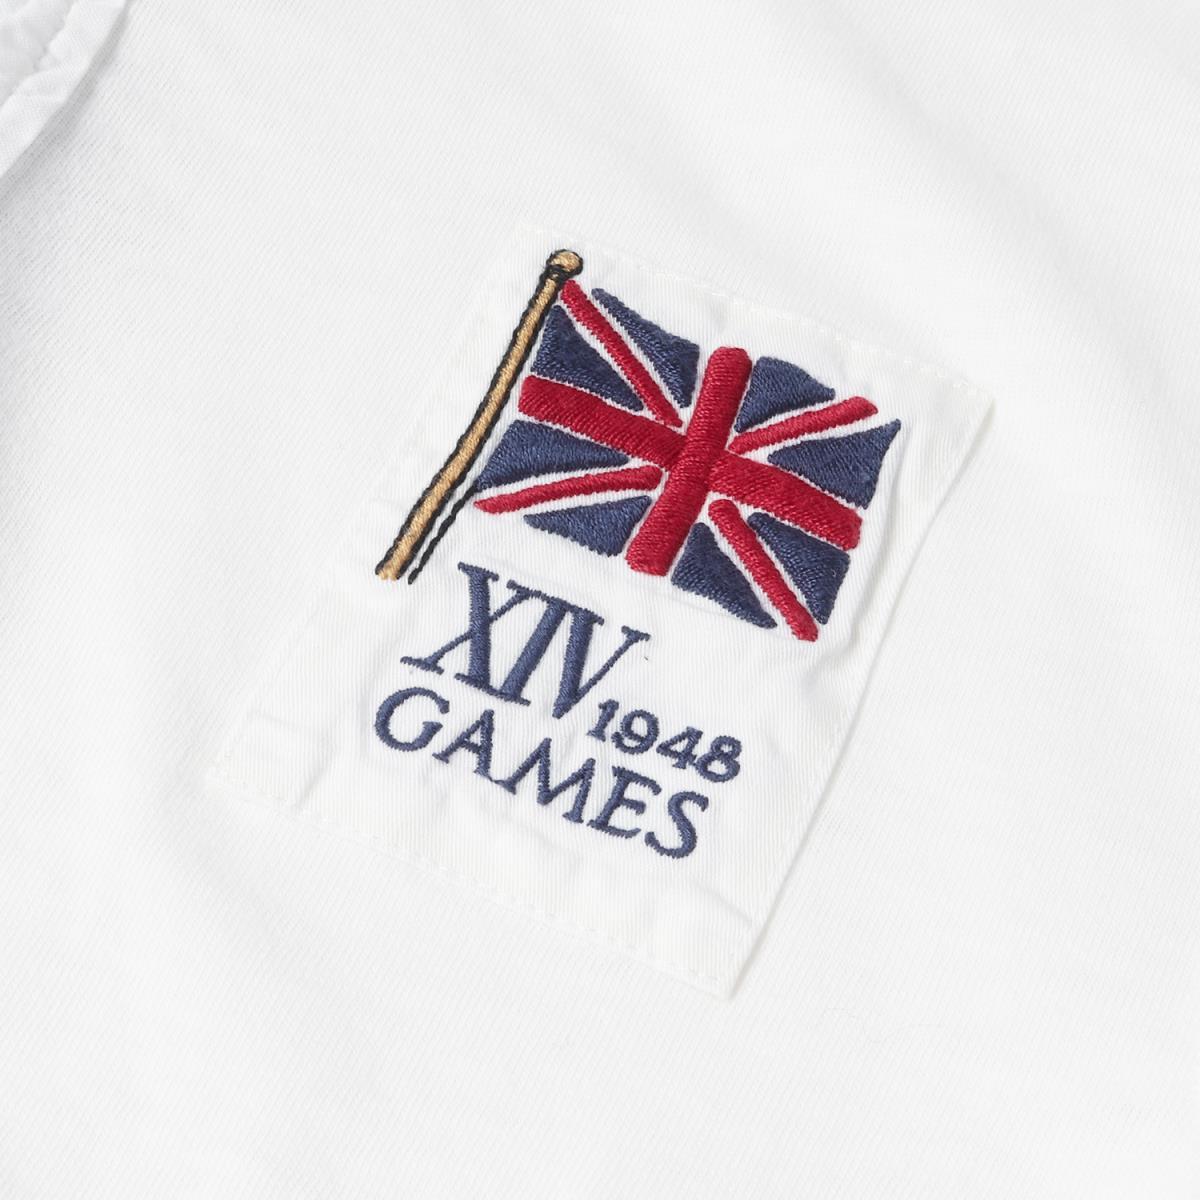 M Shirt Reeve Polo White Ralph Emblem By Laurenpolo LaurenUnion Longus Jack 8wPXN0Onk